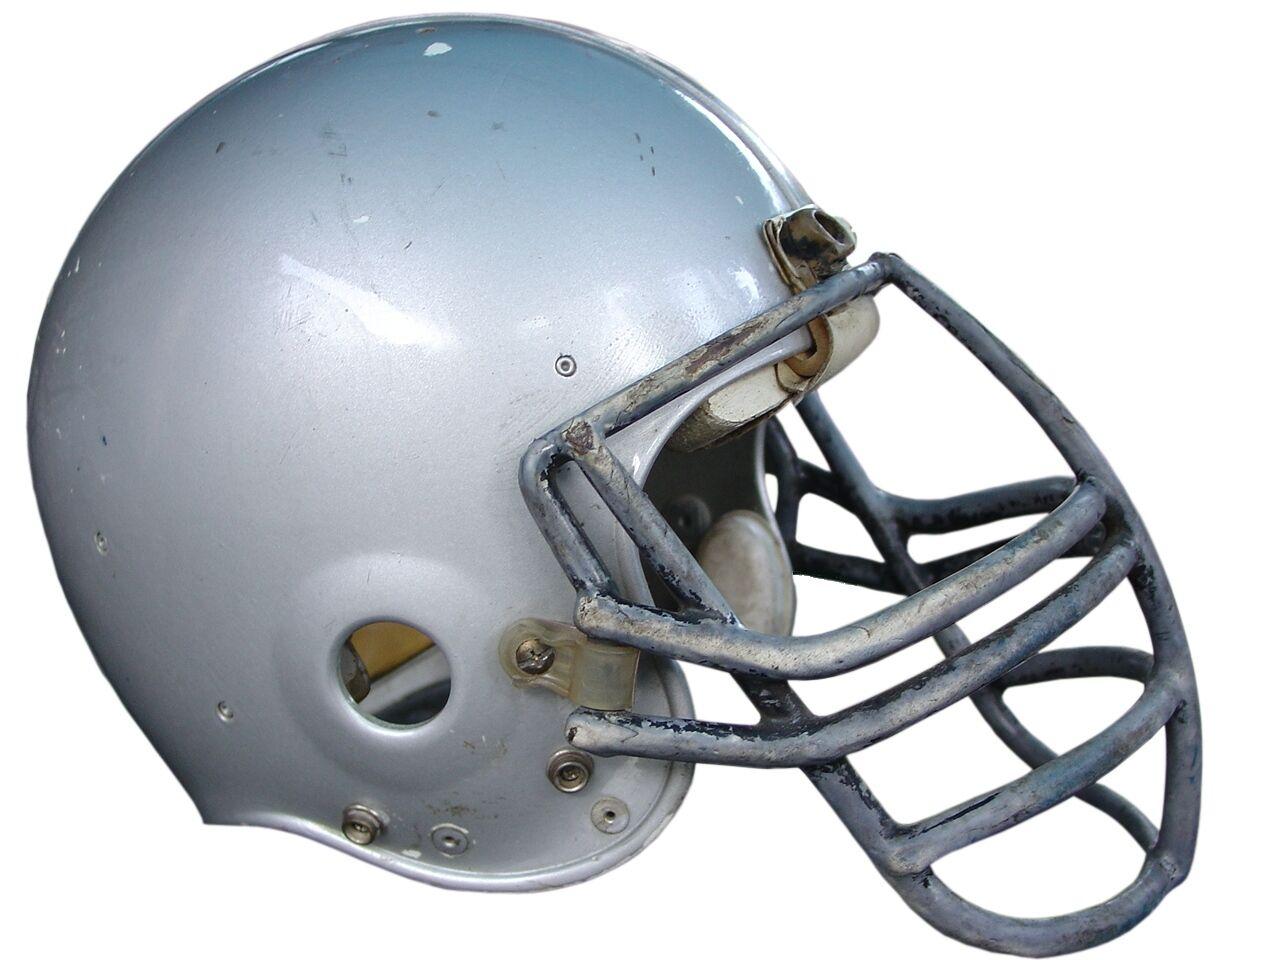 Casco football americano Noc Sae Riddel  vintage raro anni '60